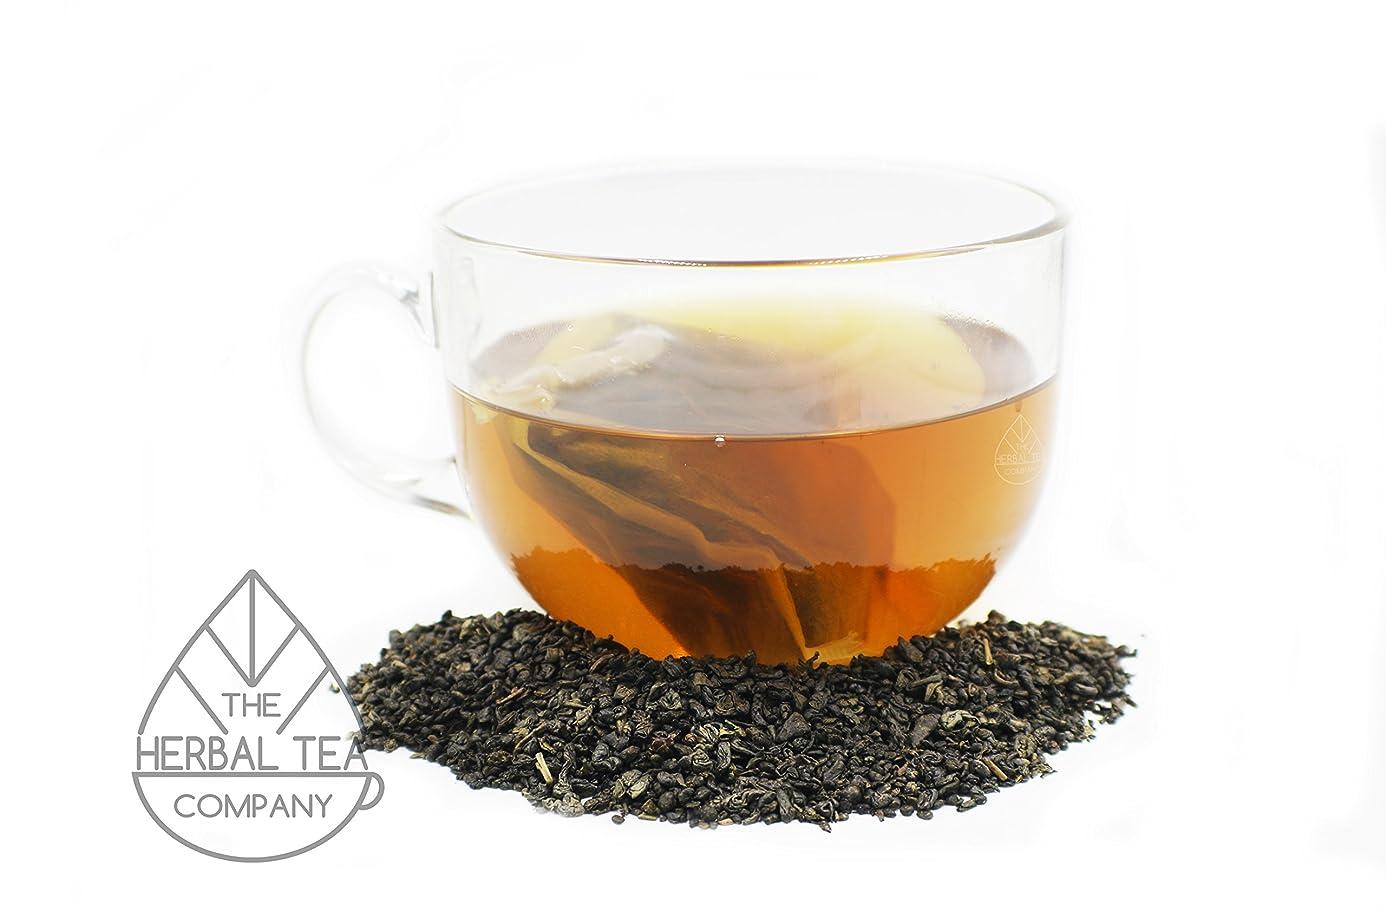 Passion Fruit Tea Green Temple Tea Blend Tea Bags Organic With Natural Flavour 25 Pack nox2948830